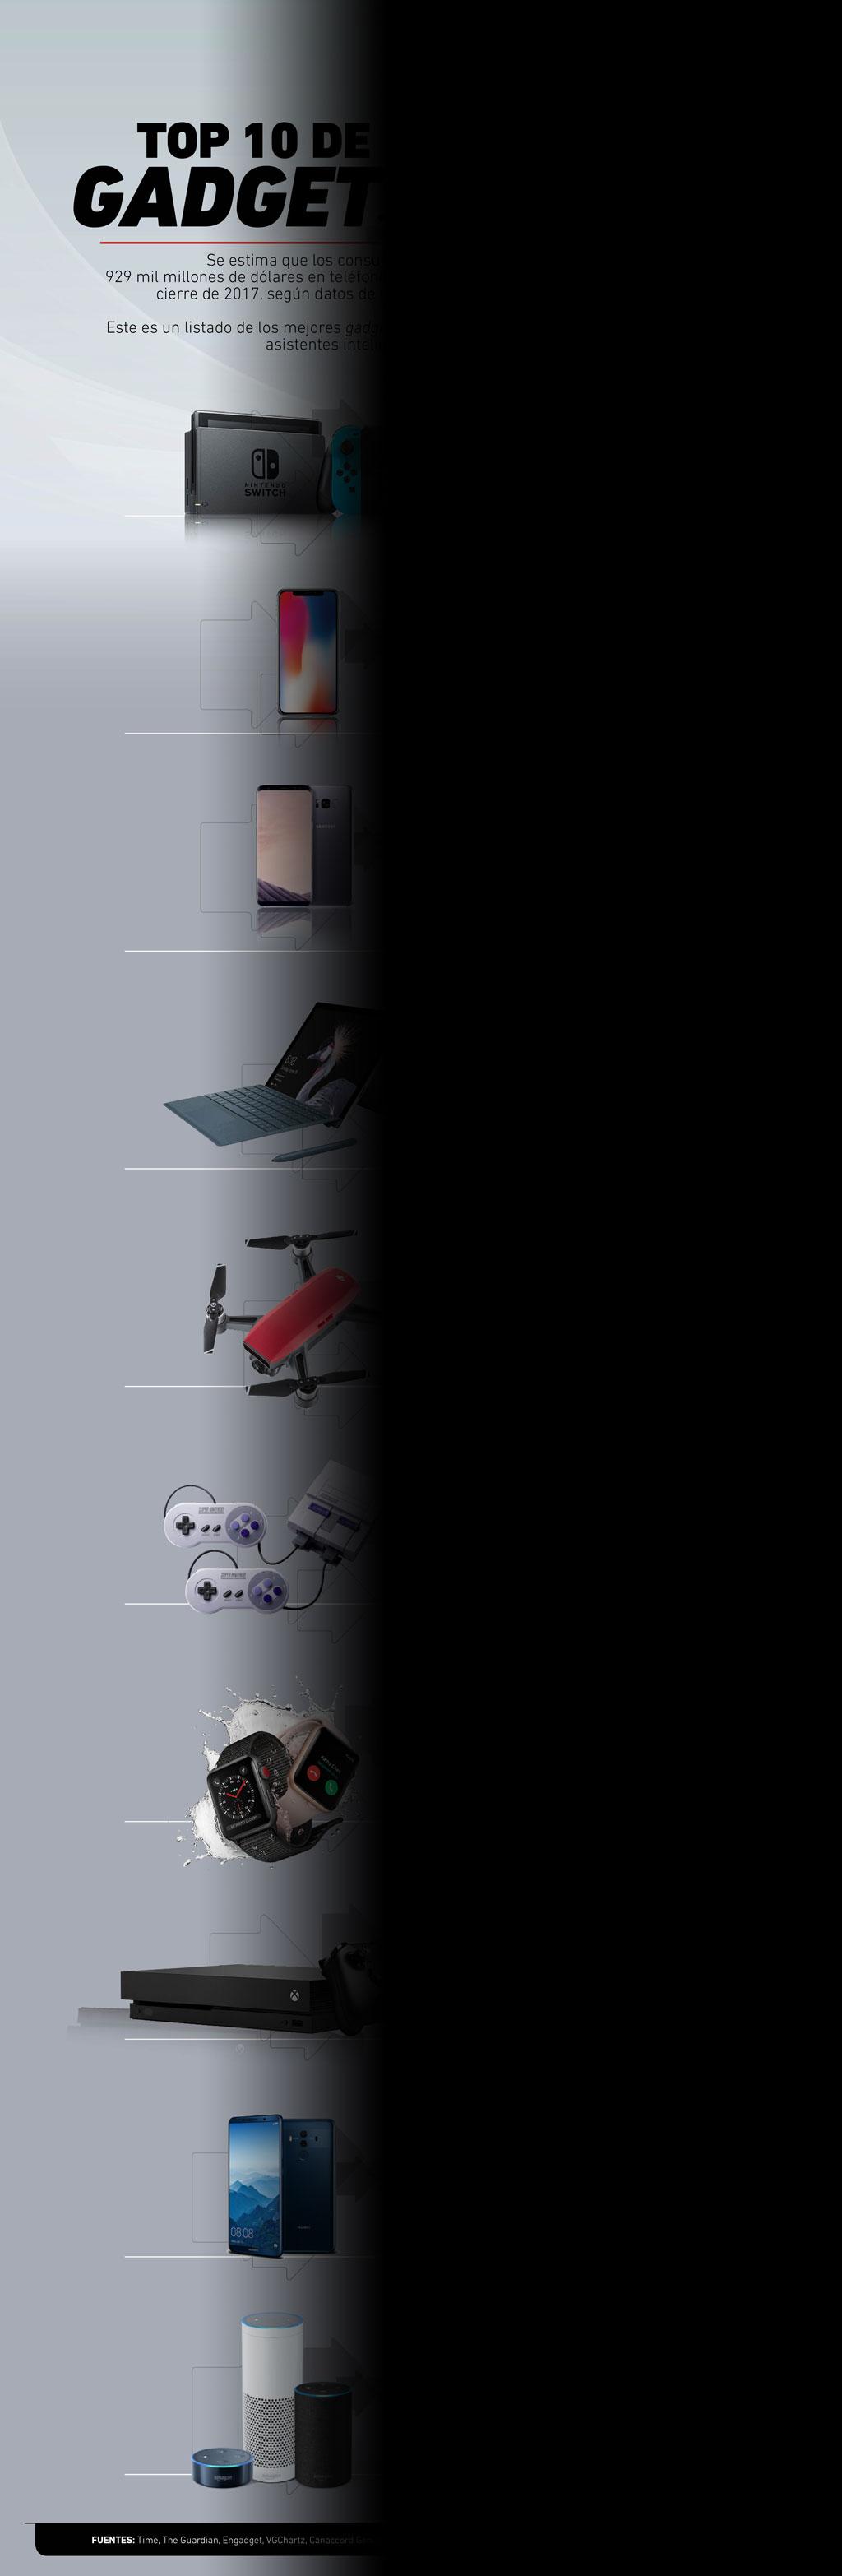 Infografia-Gadgets